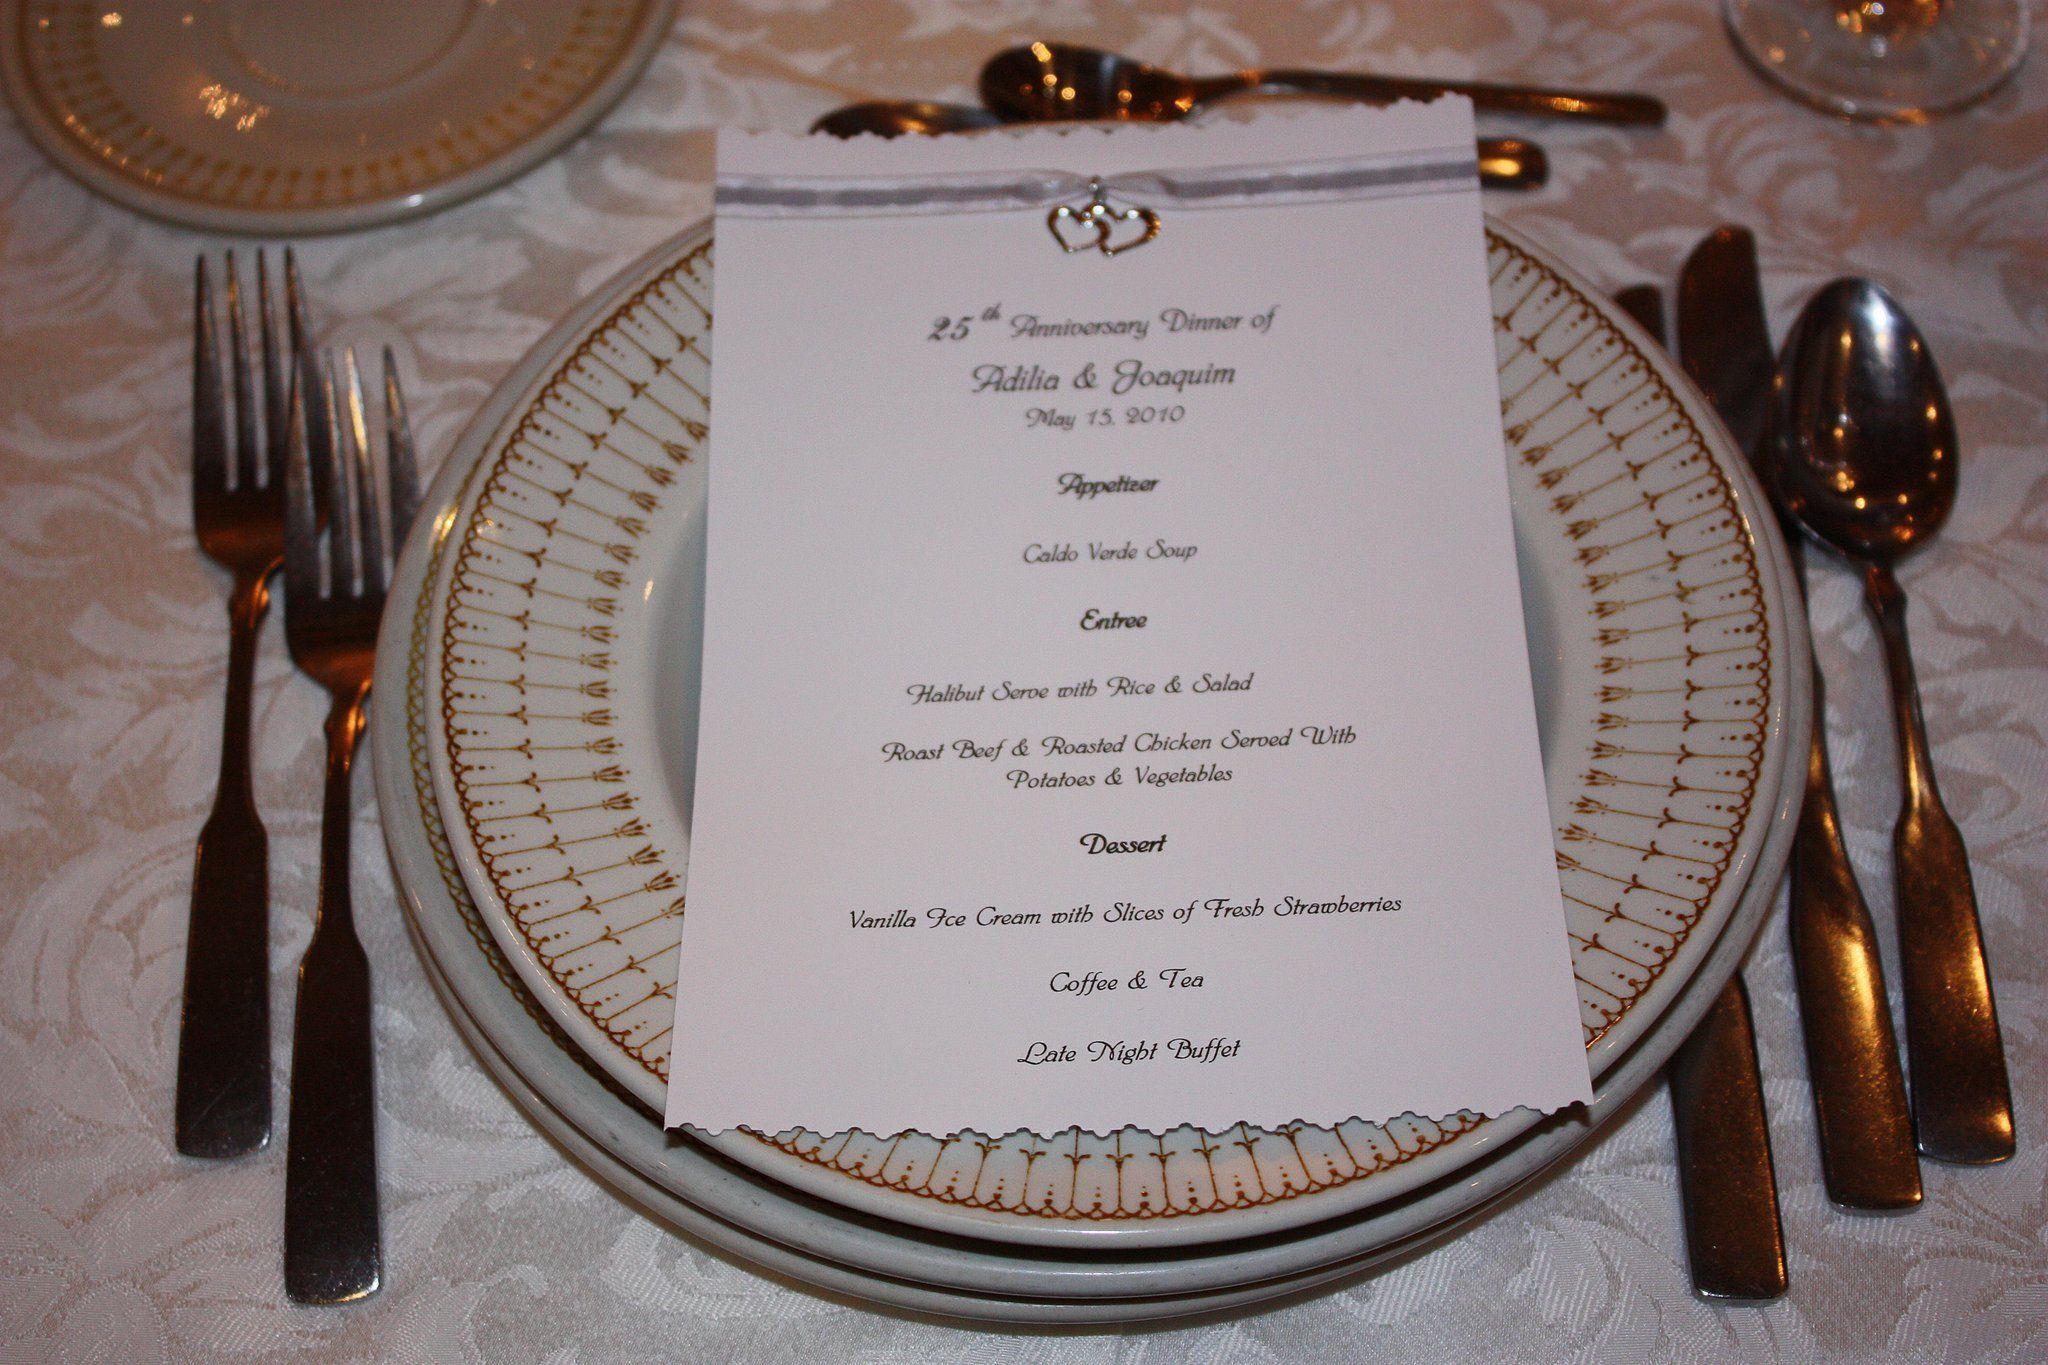 25th Wedding Anniversary Menu 25th Wedding Anniversary Wedding Event Planning Wedding Anniversary